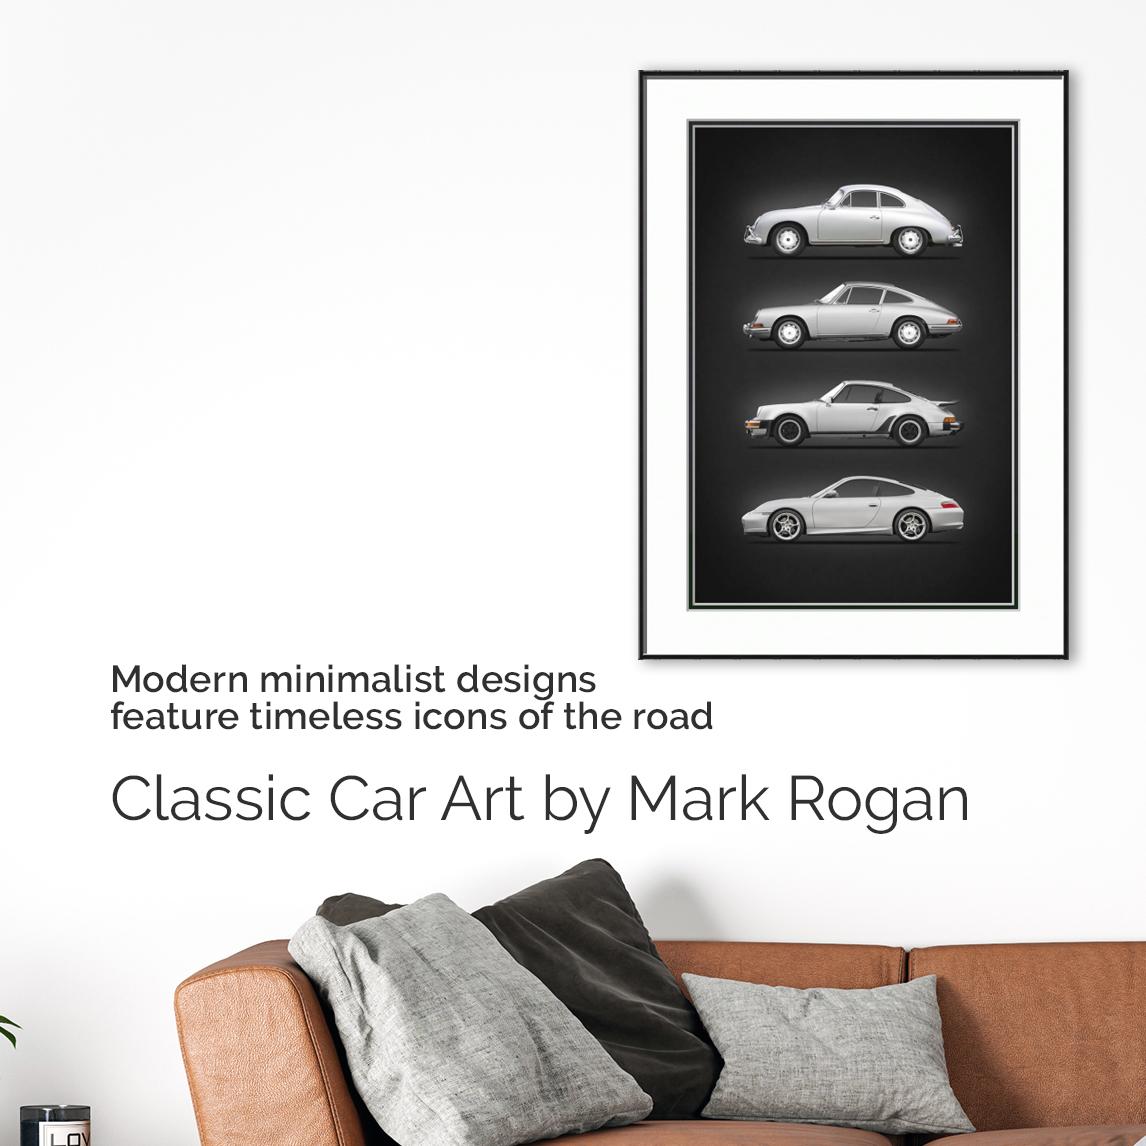 Classic Car Art by Mark Rogan